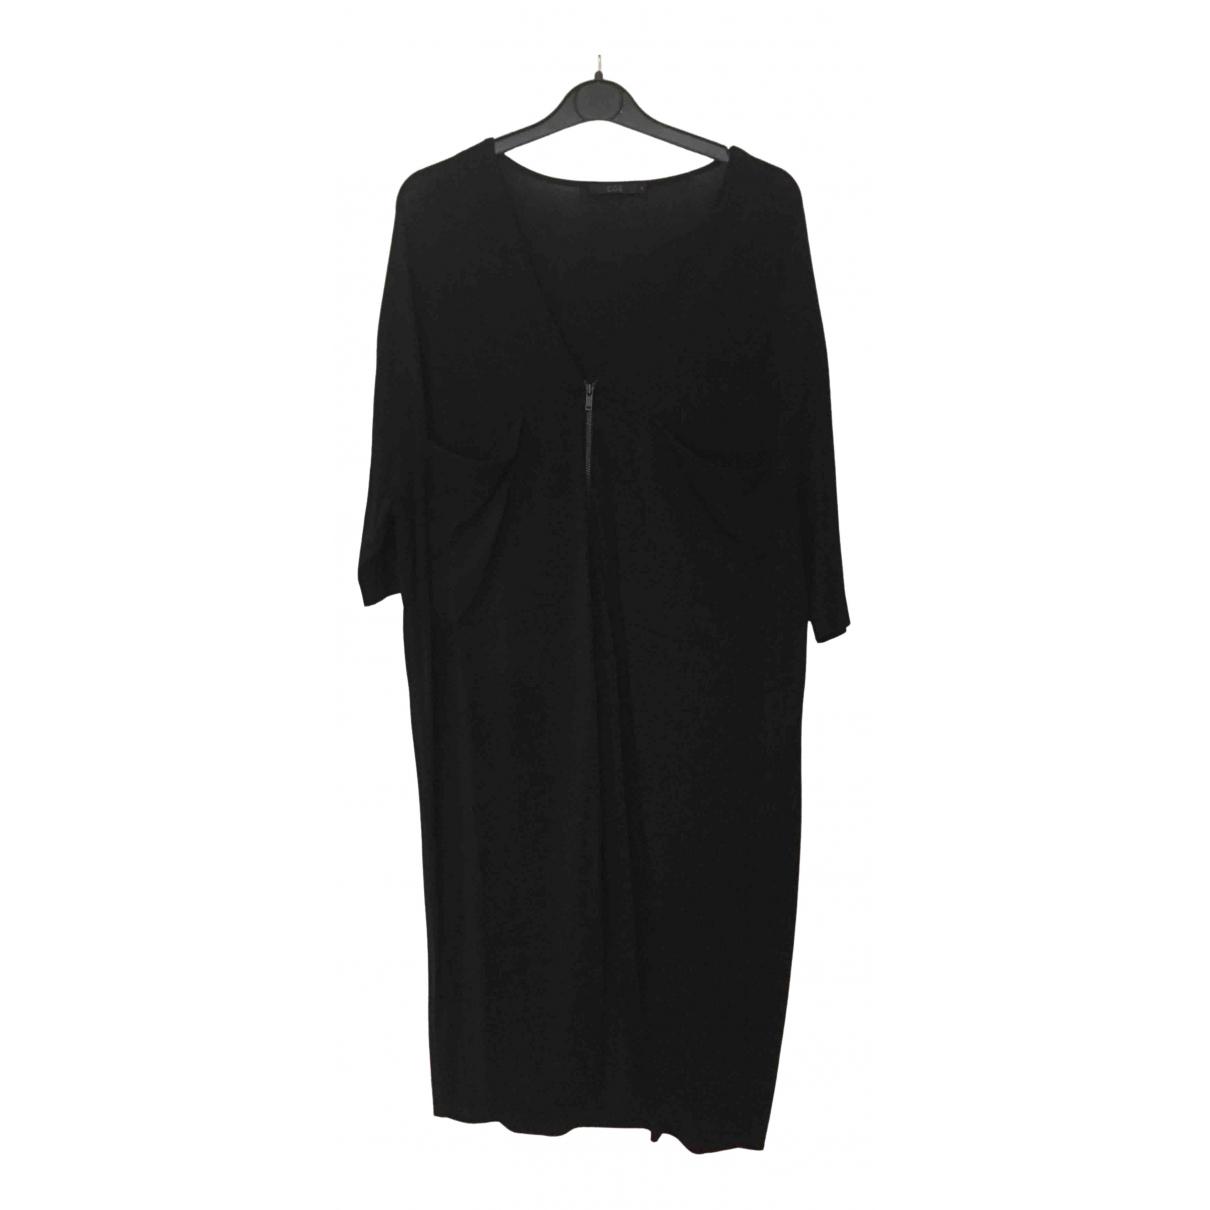 Cos \N Black dress for Women M International